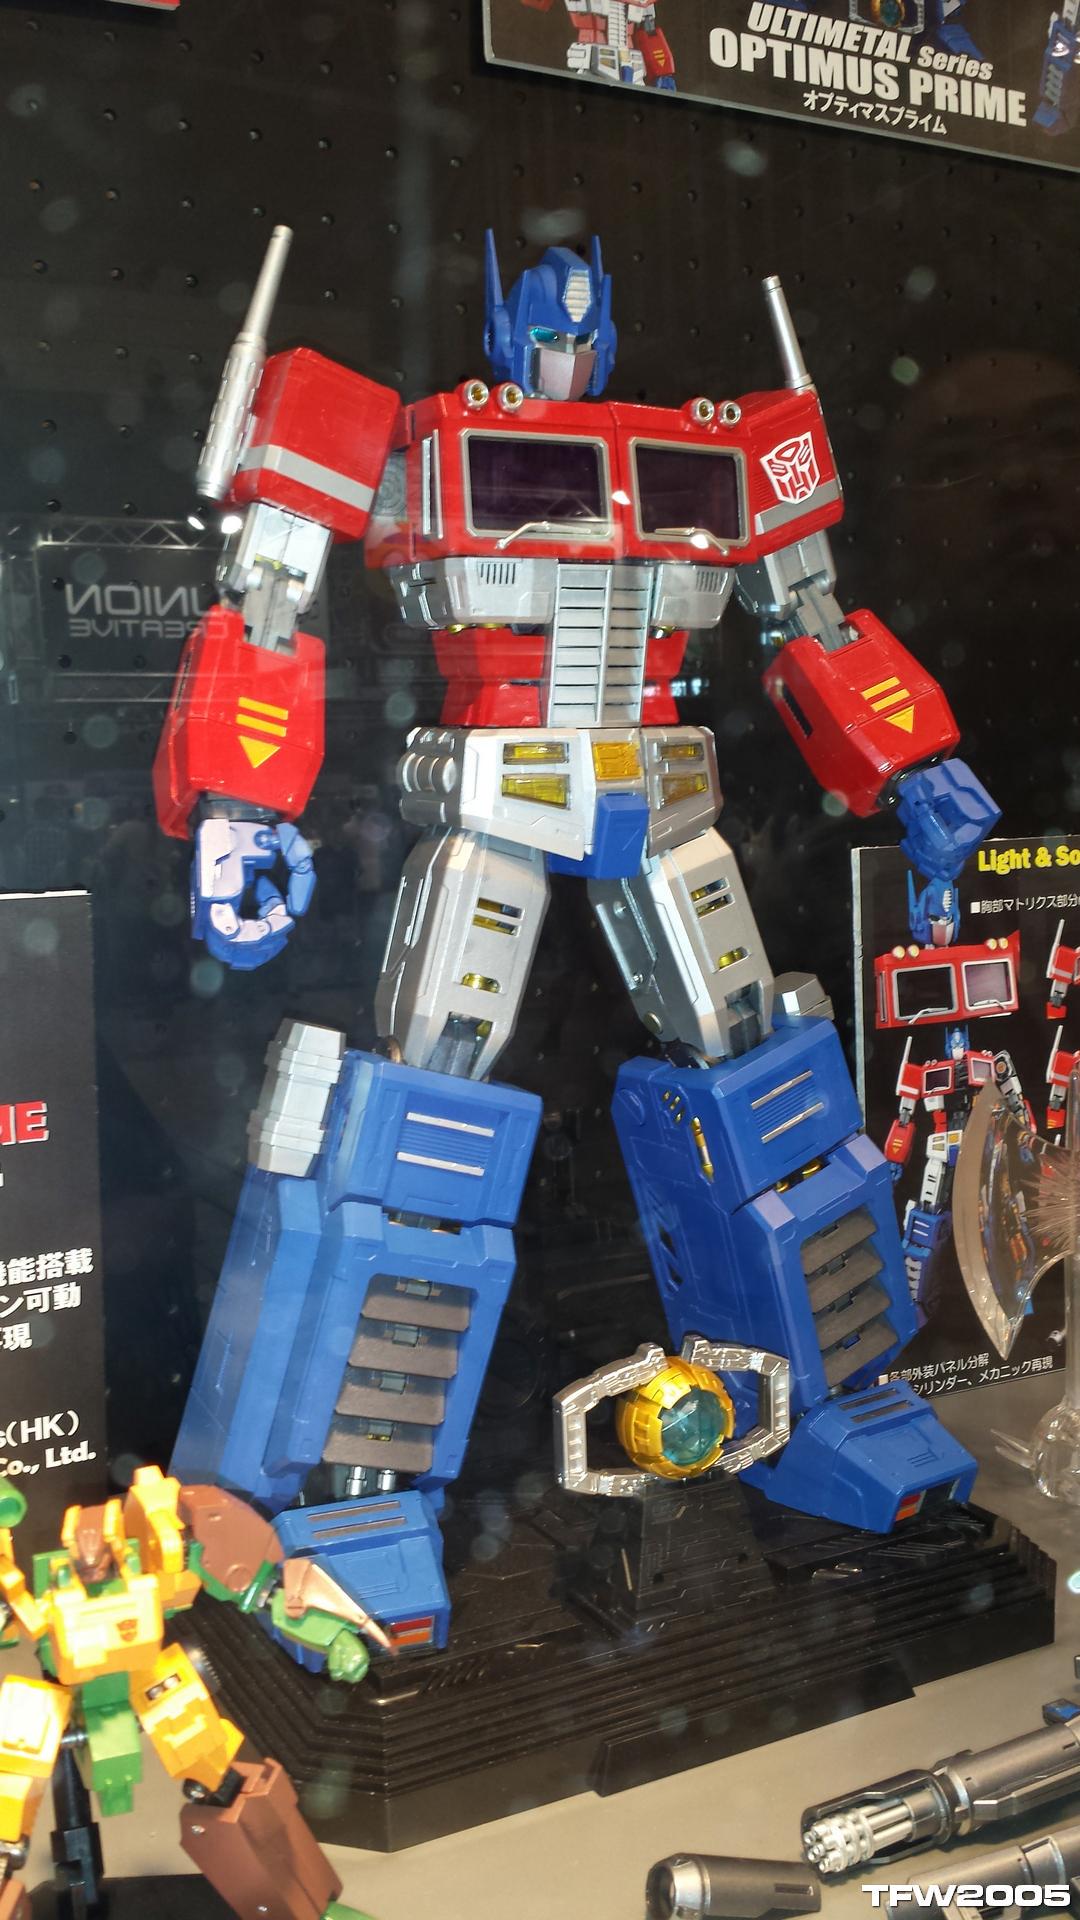 Figurines Transformers G1 (articulé, non transformable) ― Par 3A, Action Toys, Fewture, Toys Alliance, Sentinel, Kotobukiya, Kids Logic, Herocross, EX Gokin, etc Wonderfest-004_1375021507